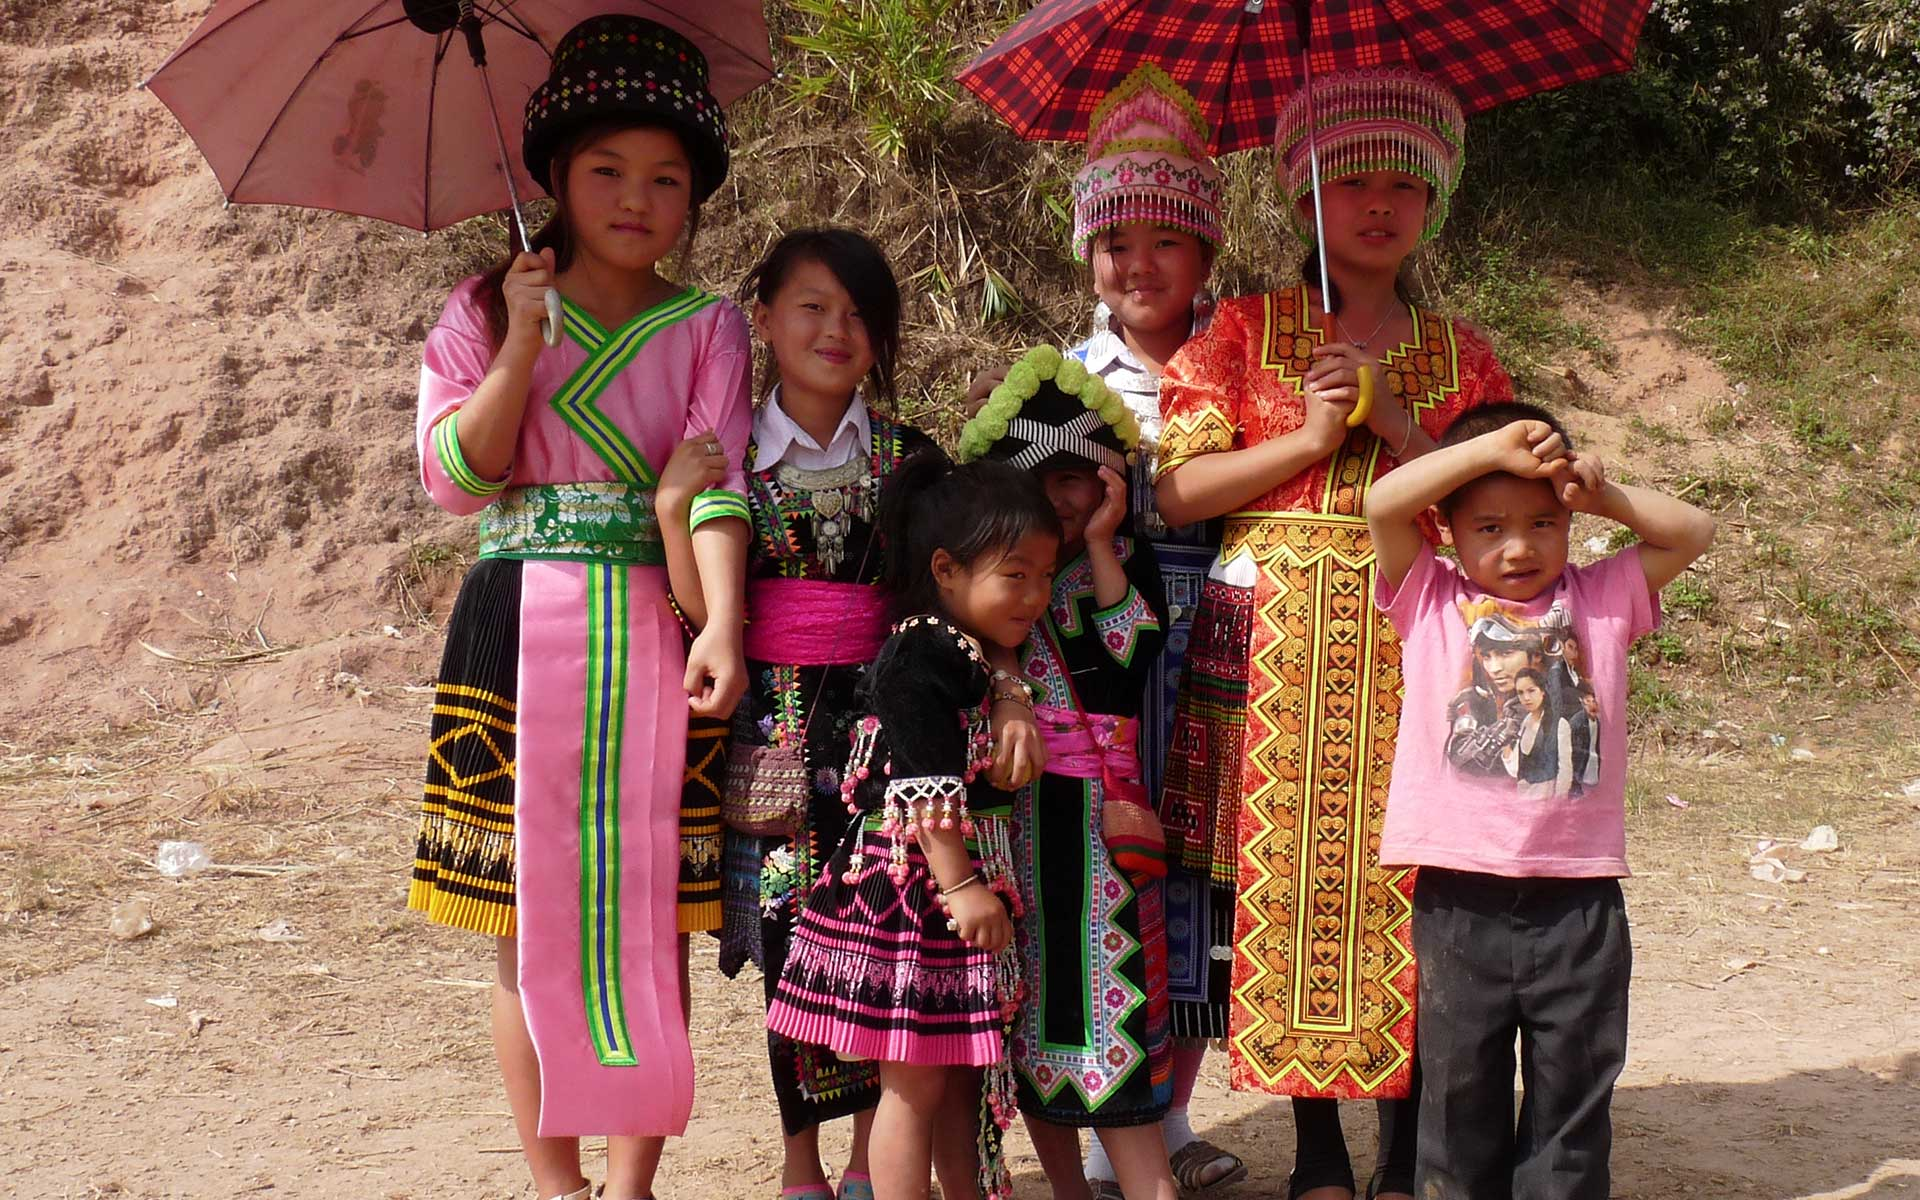 Hmong people laos